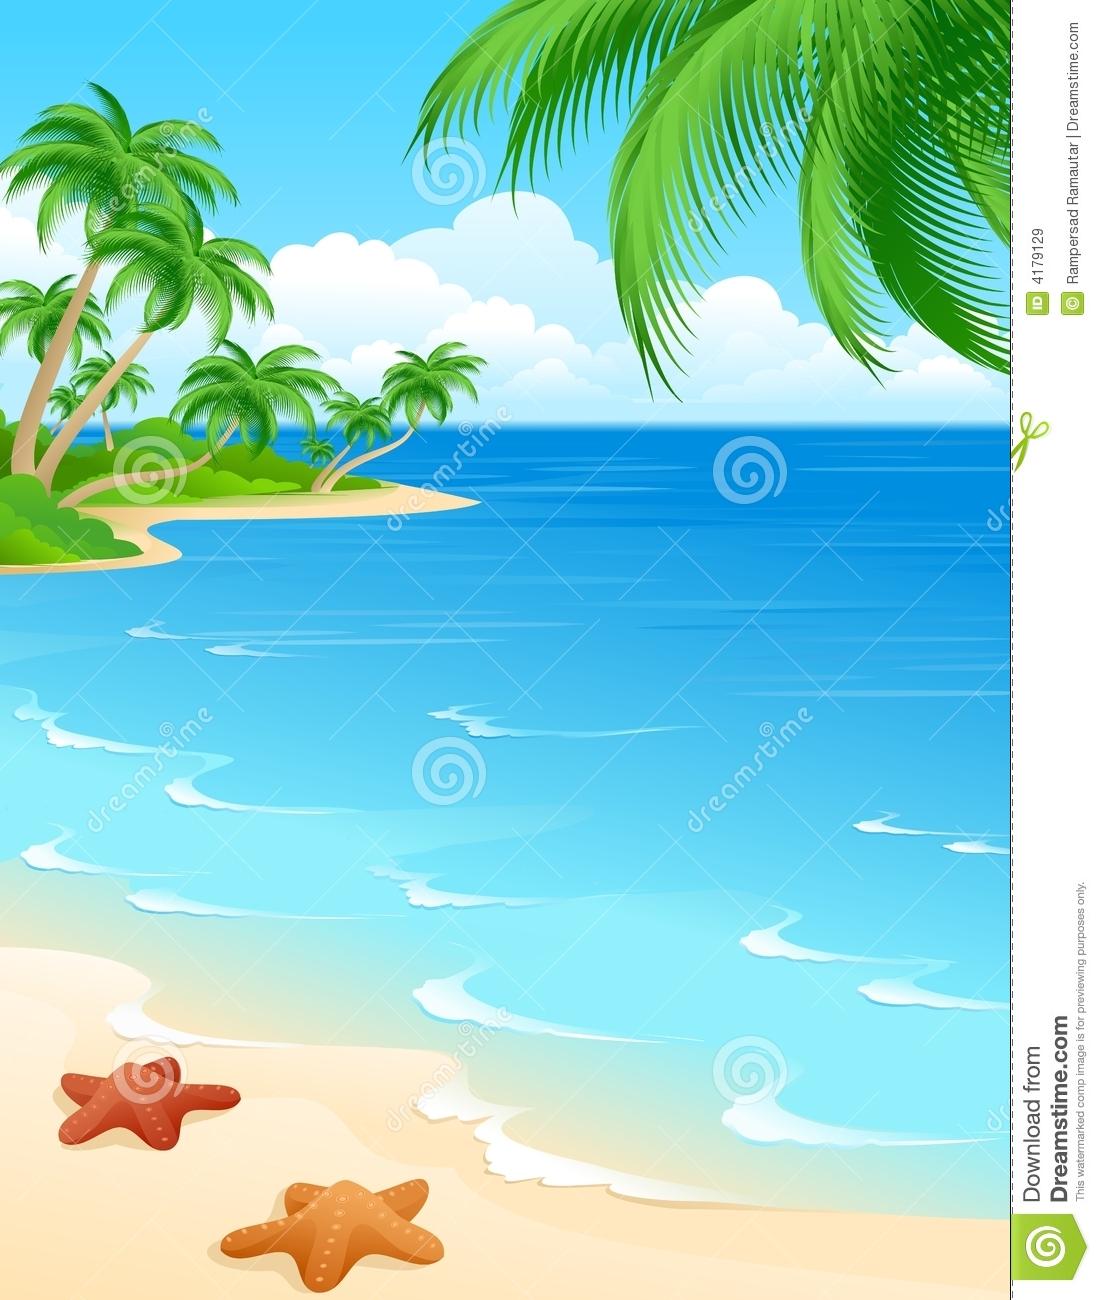 Beach clipart beach scene.  collection of high